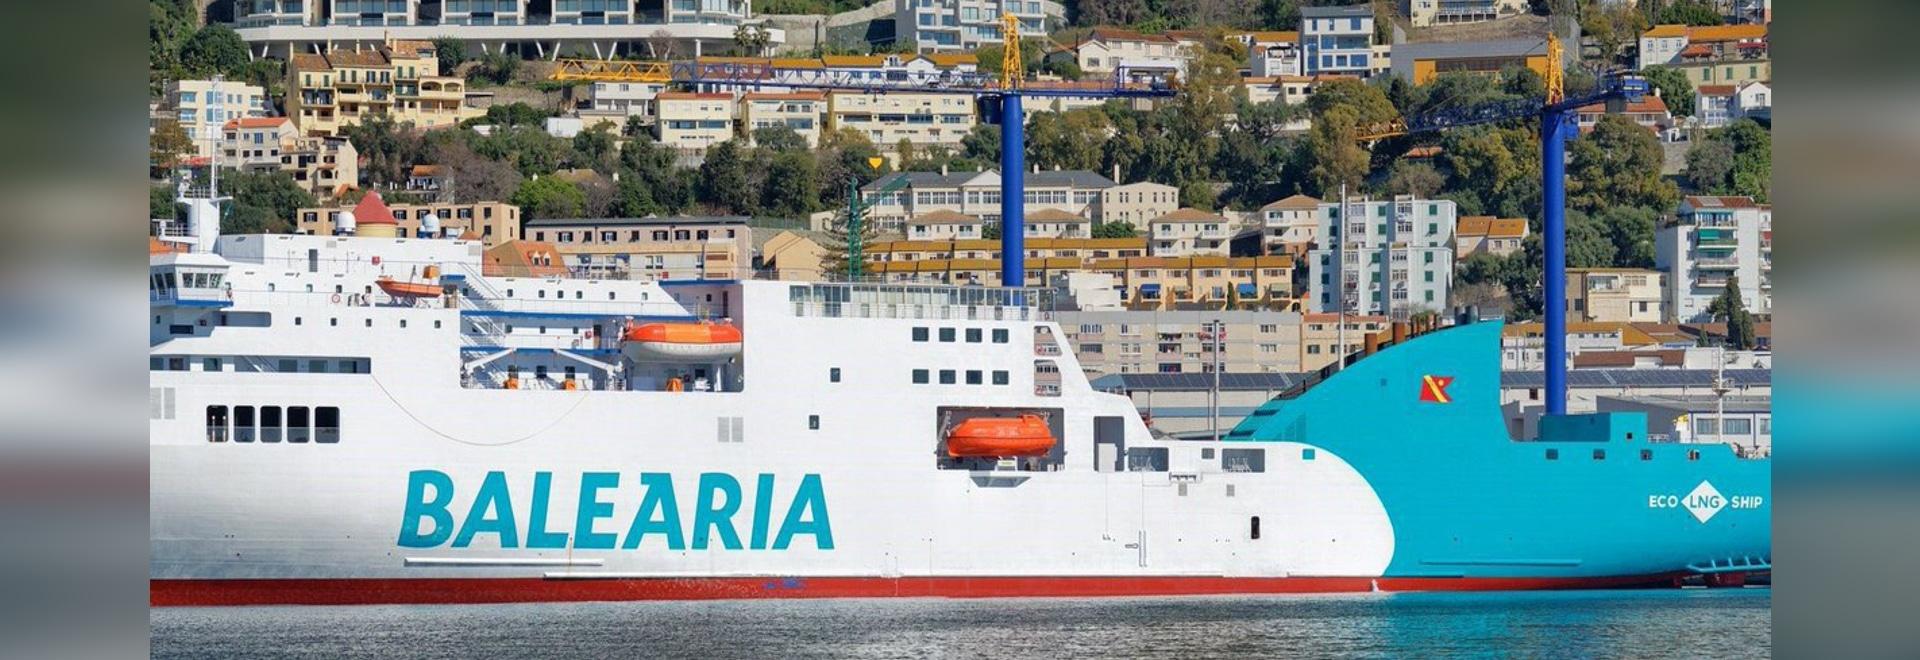 Gibdock: 1st Baleària Ferry Converted to LNG